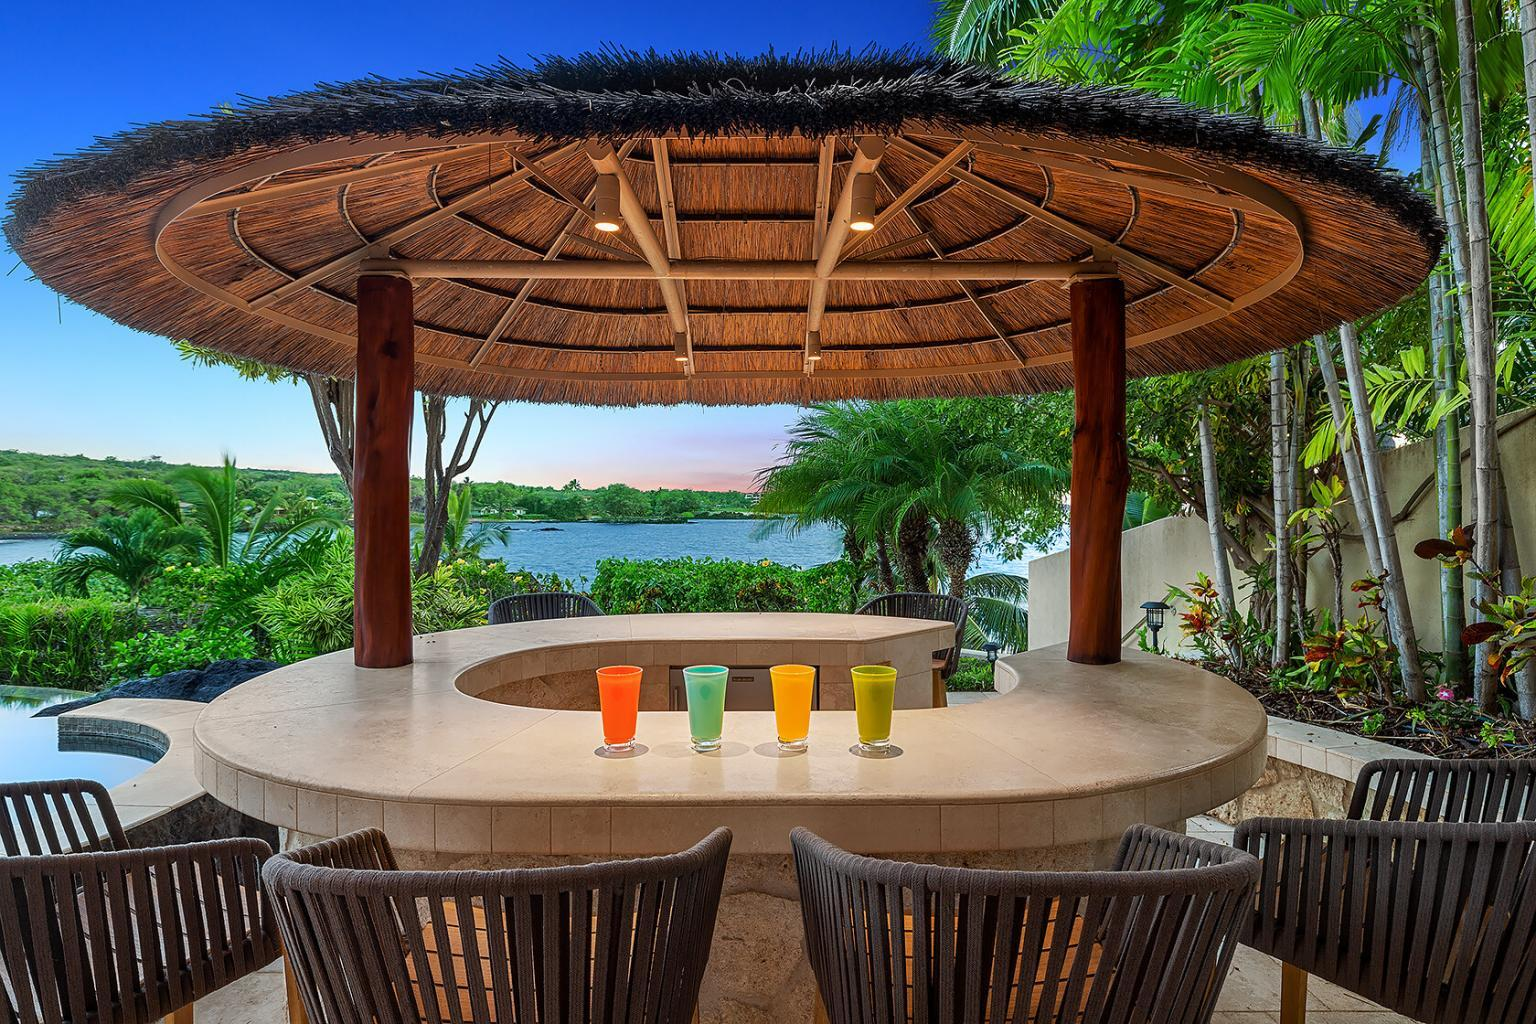 resort-bar-hotel-photography-panaviz